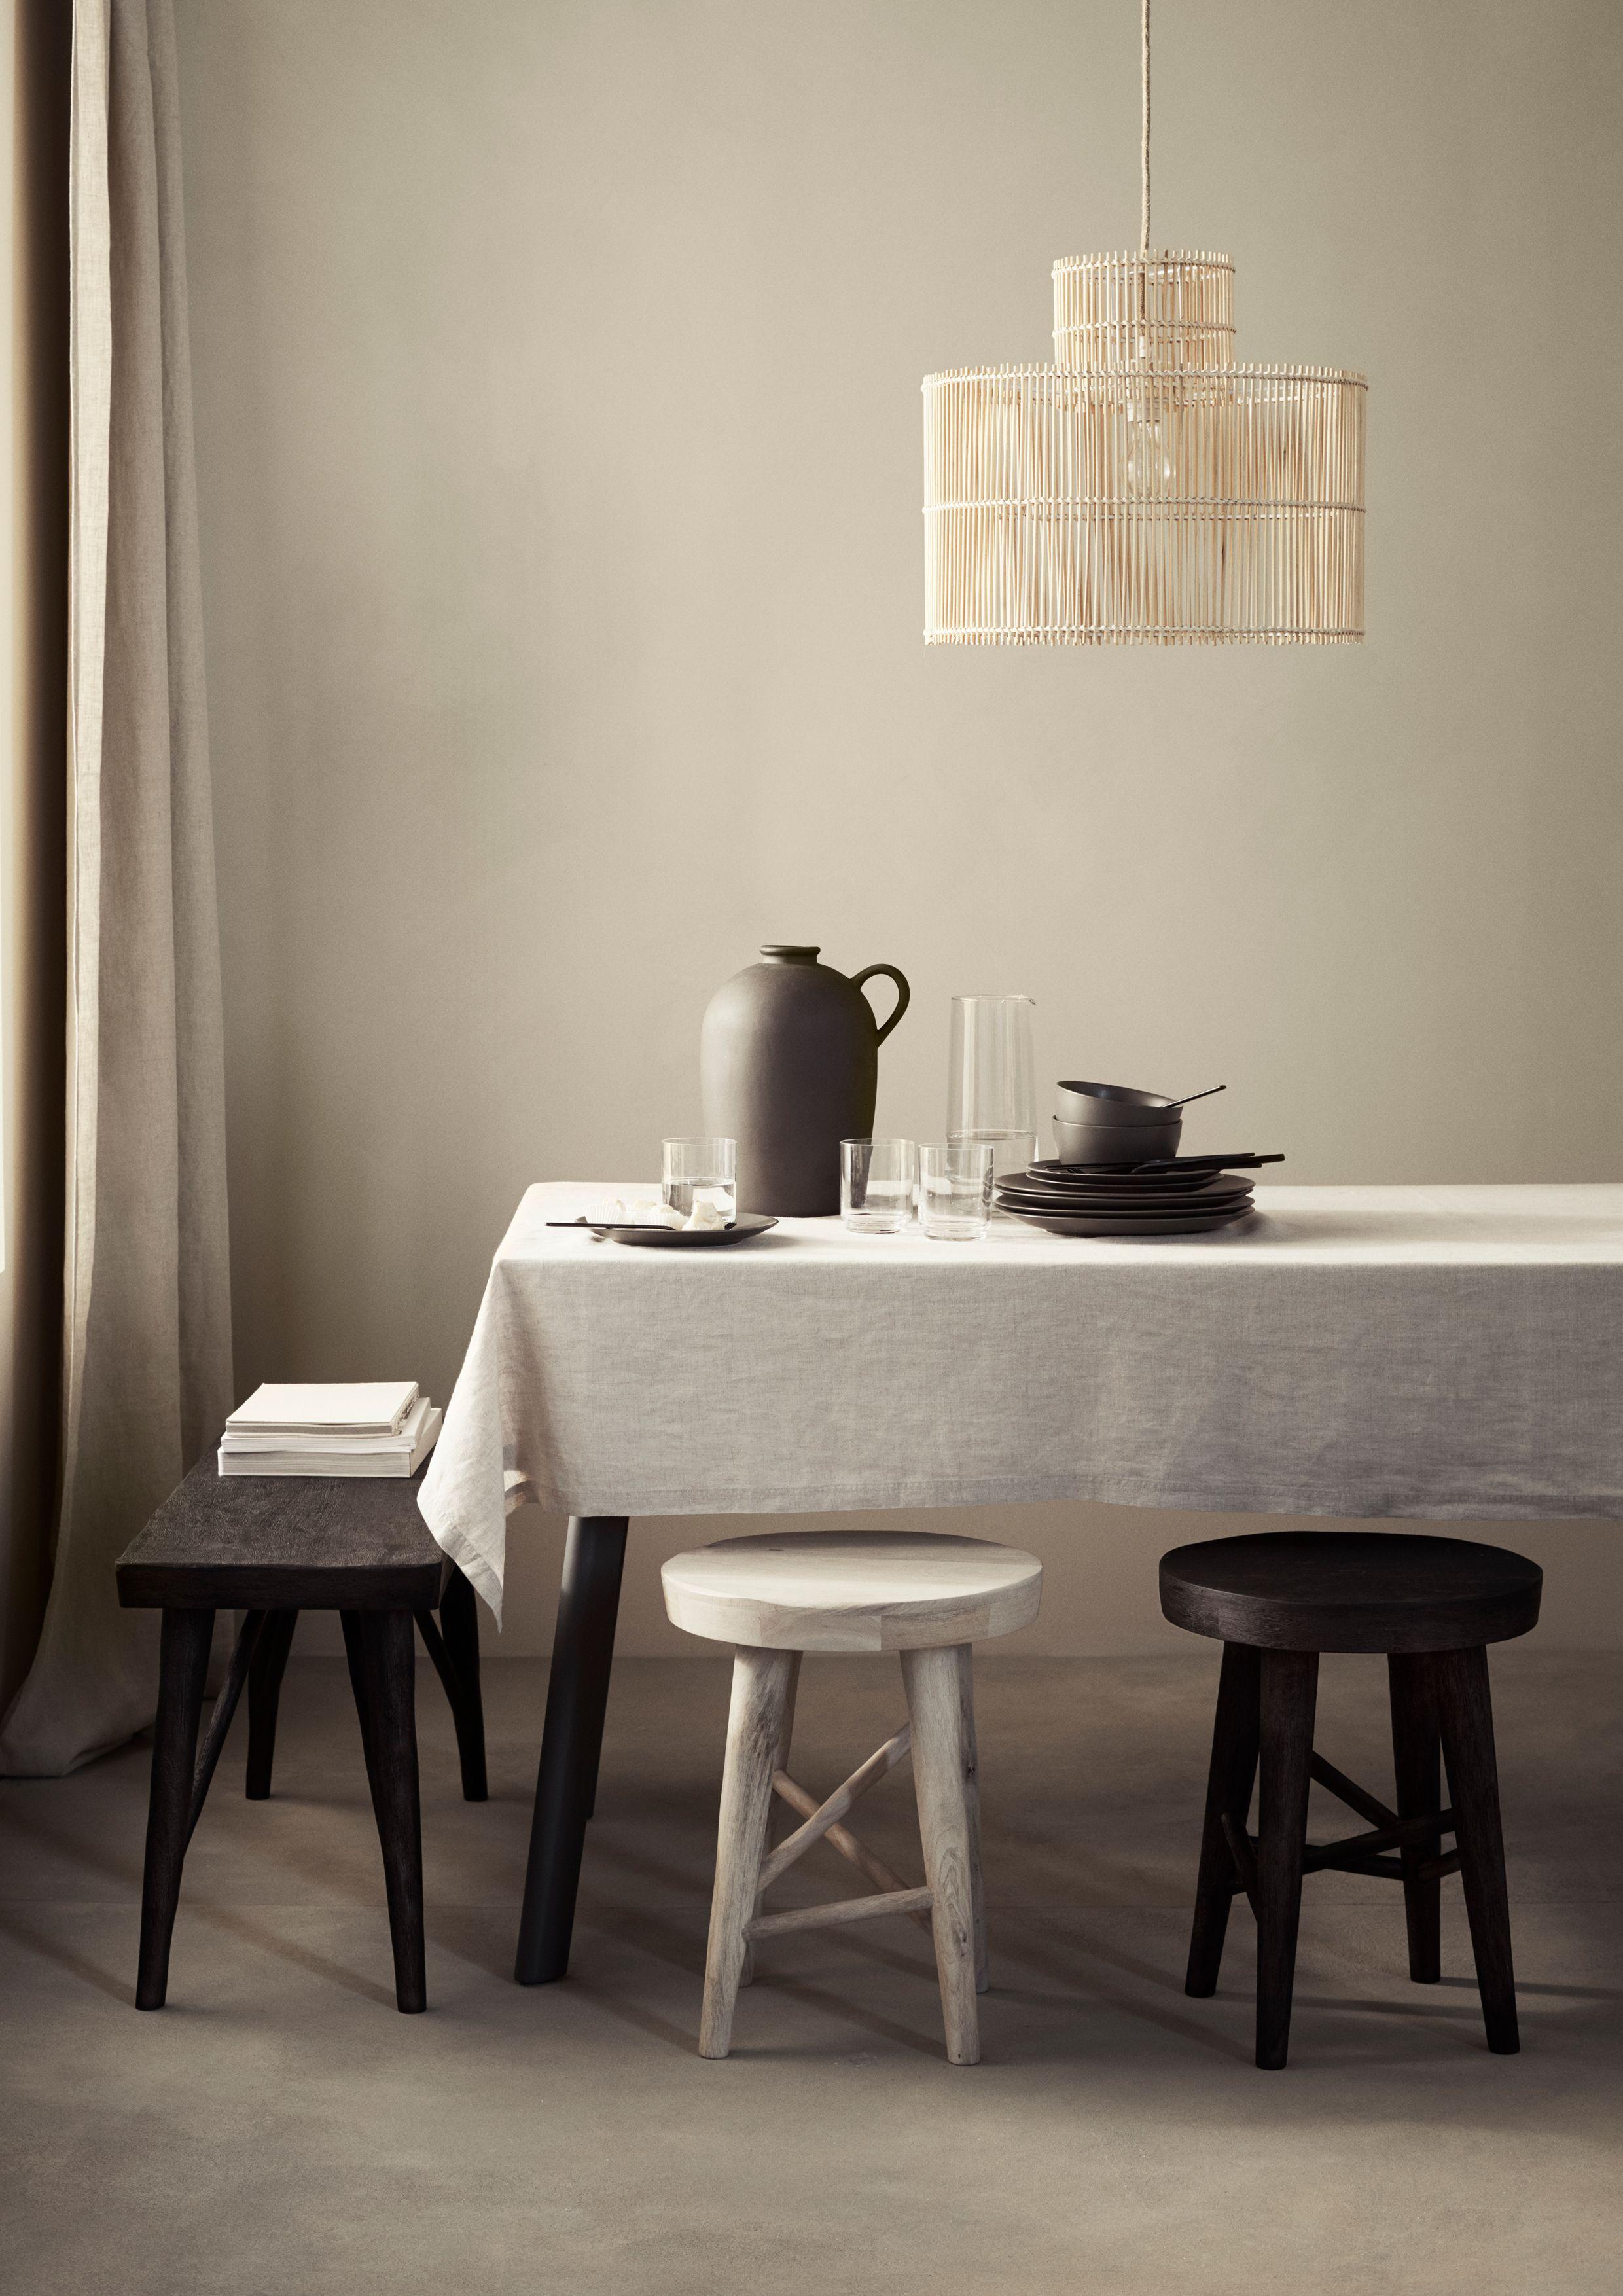 Etonnant Hu0026M Home Furniture Collection